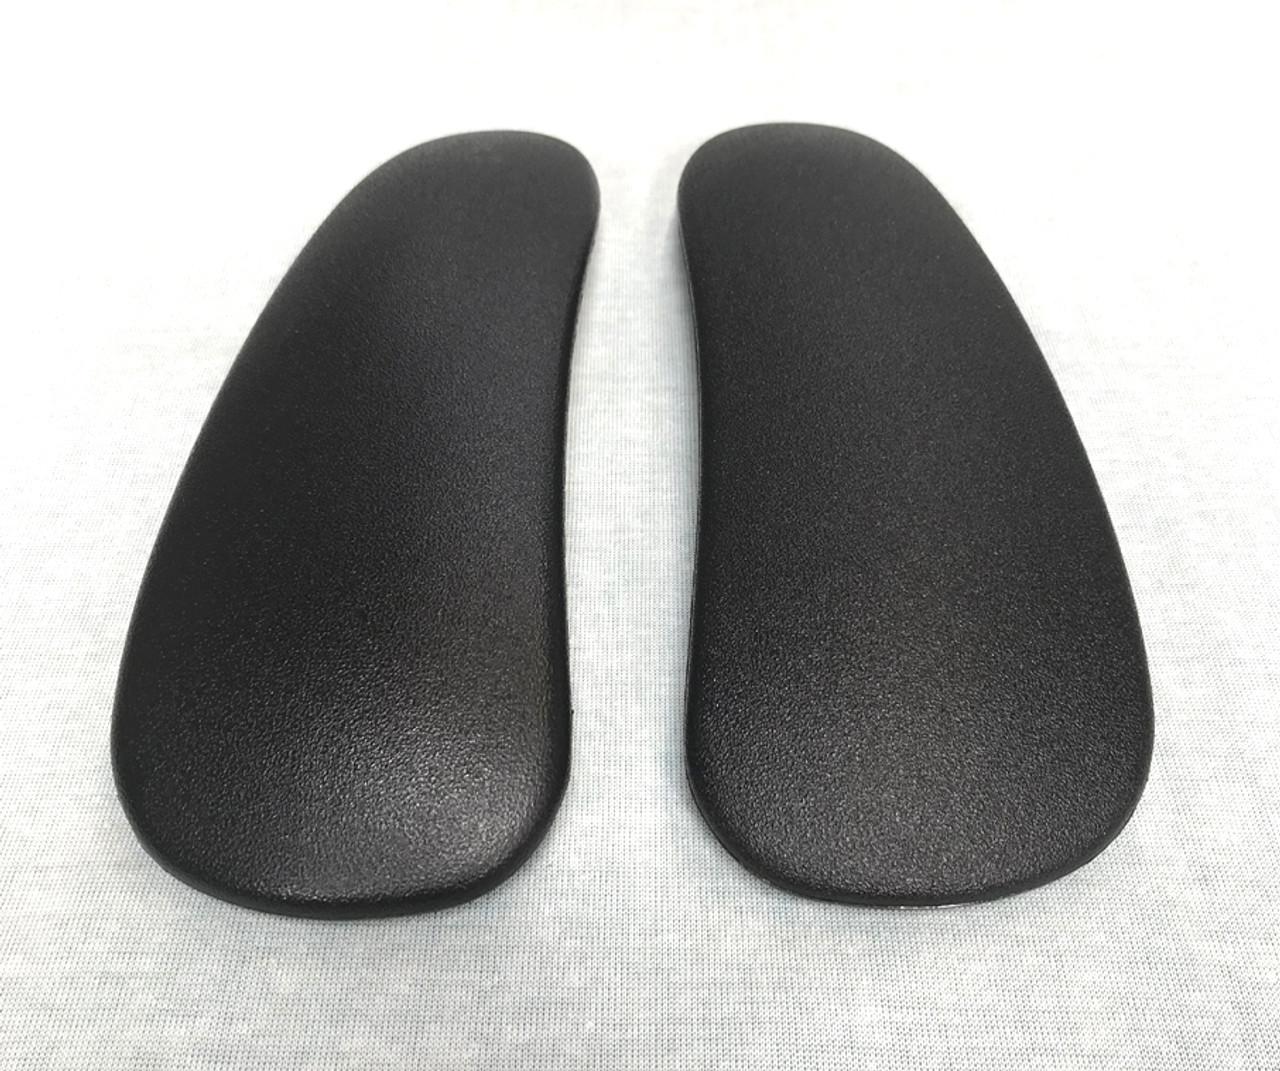 Okamura Contessa - arm pads